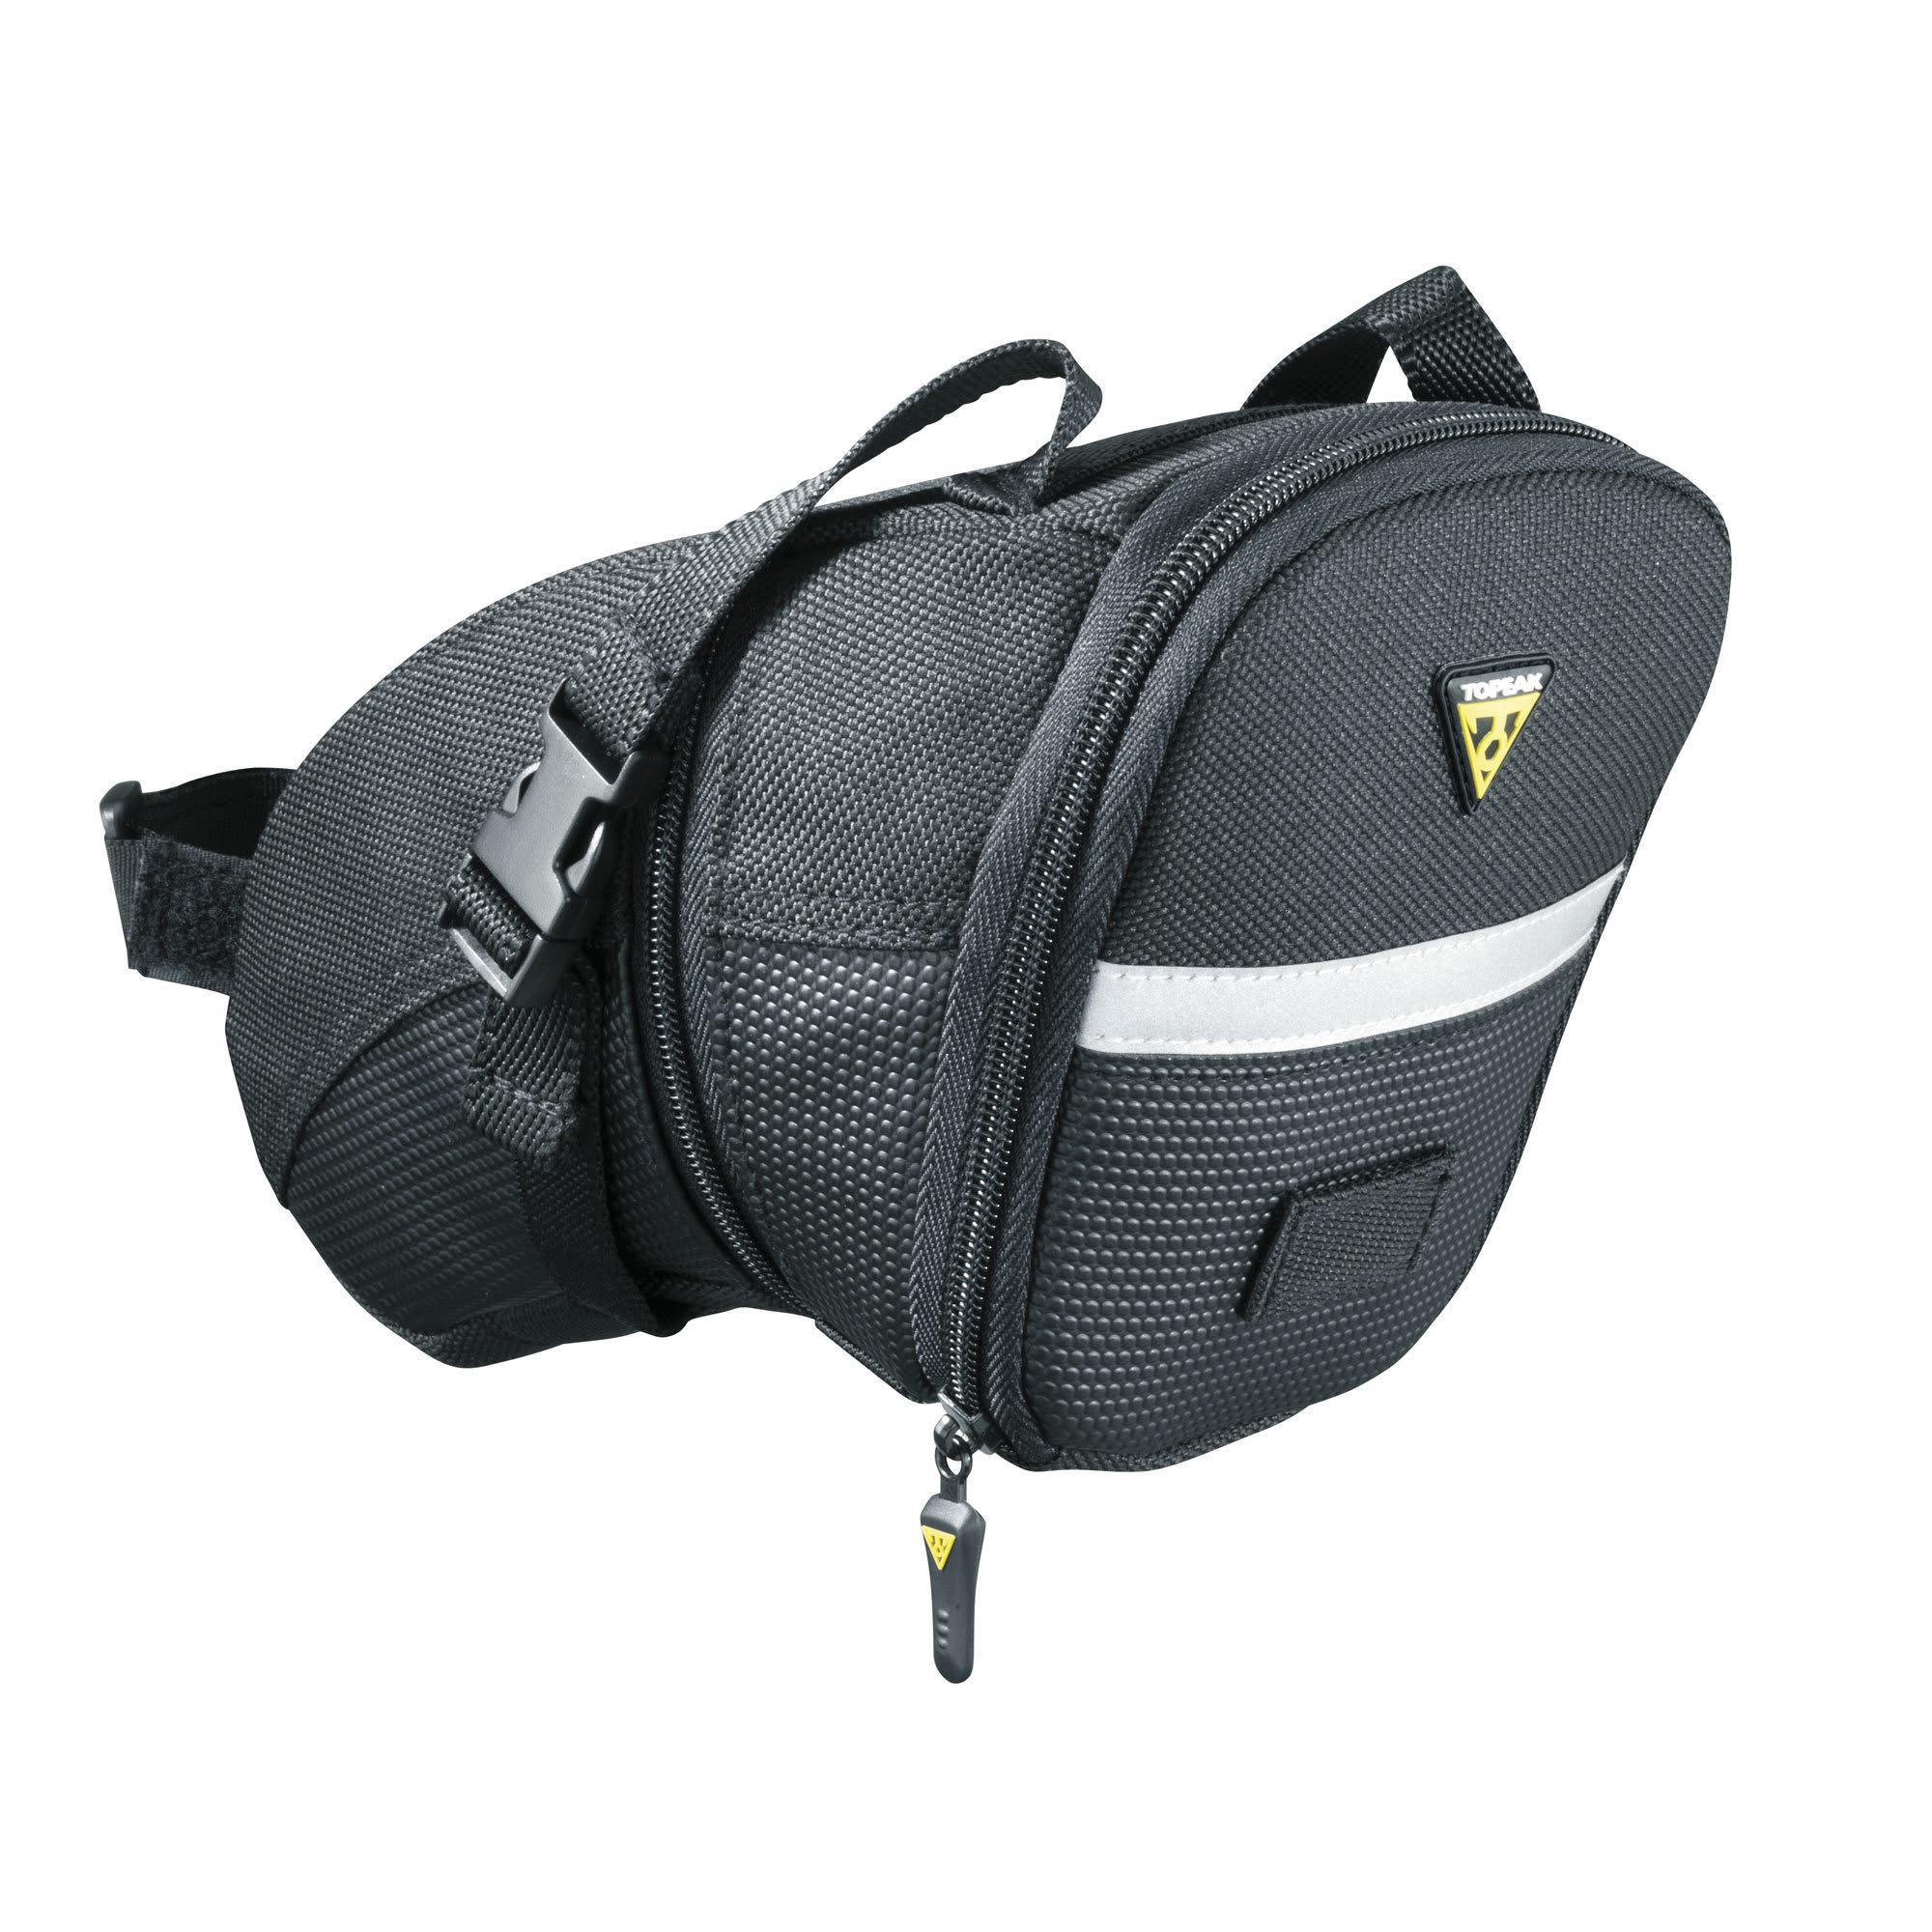 online store a03a9 13689 Kjøp Topeak Aero Wedge Pack Saddle Bag L fra Outnorth